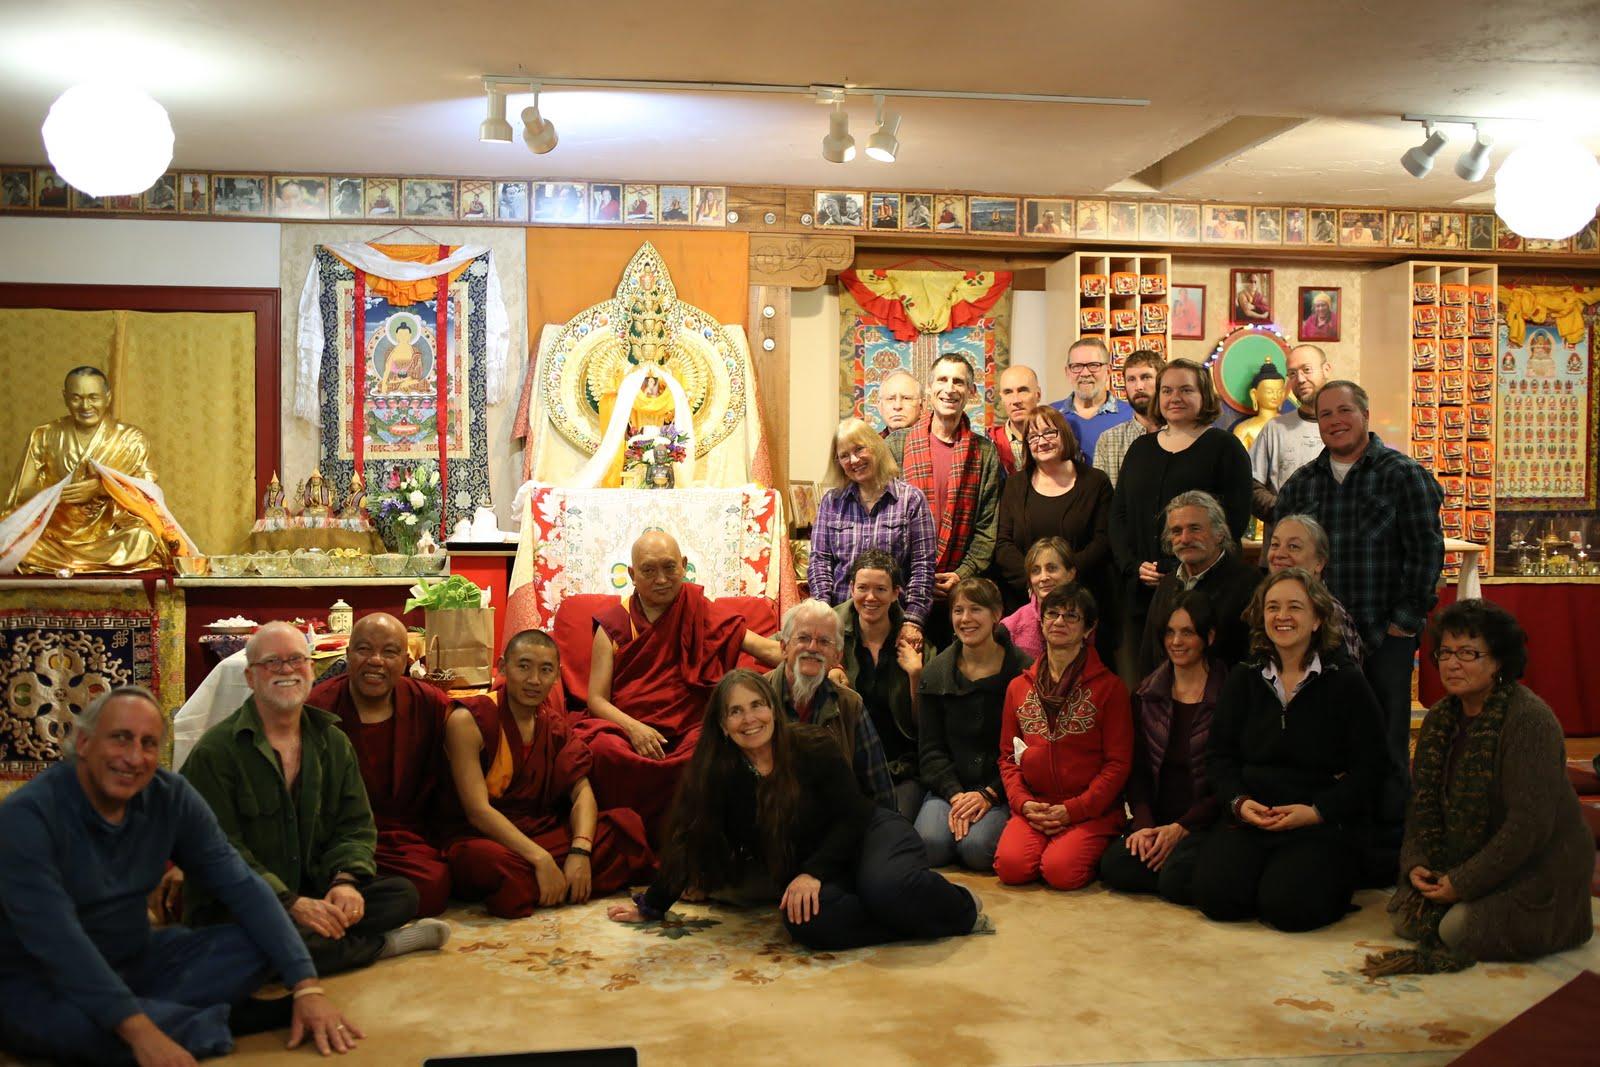 Rinpoche at Vajrapani Institute. Boulder Creek, California. November 2013. Photo by Ven. Thubten Kunsang.